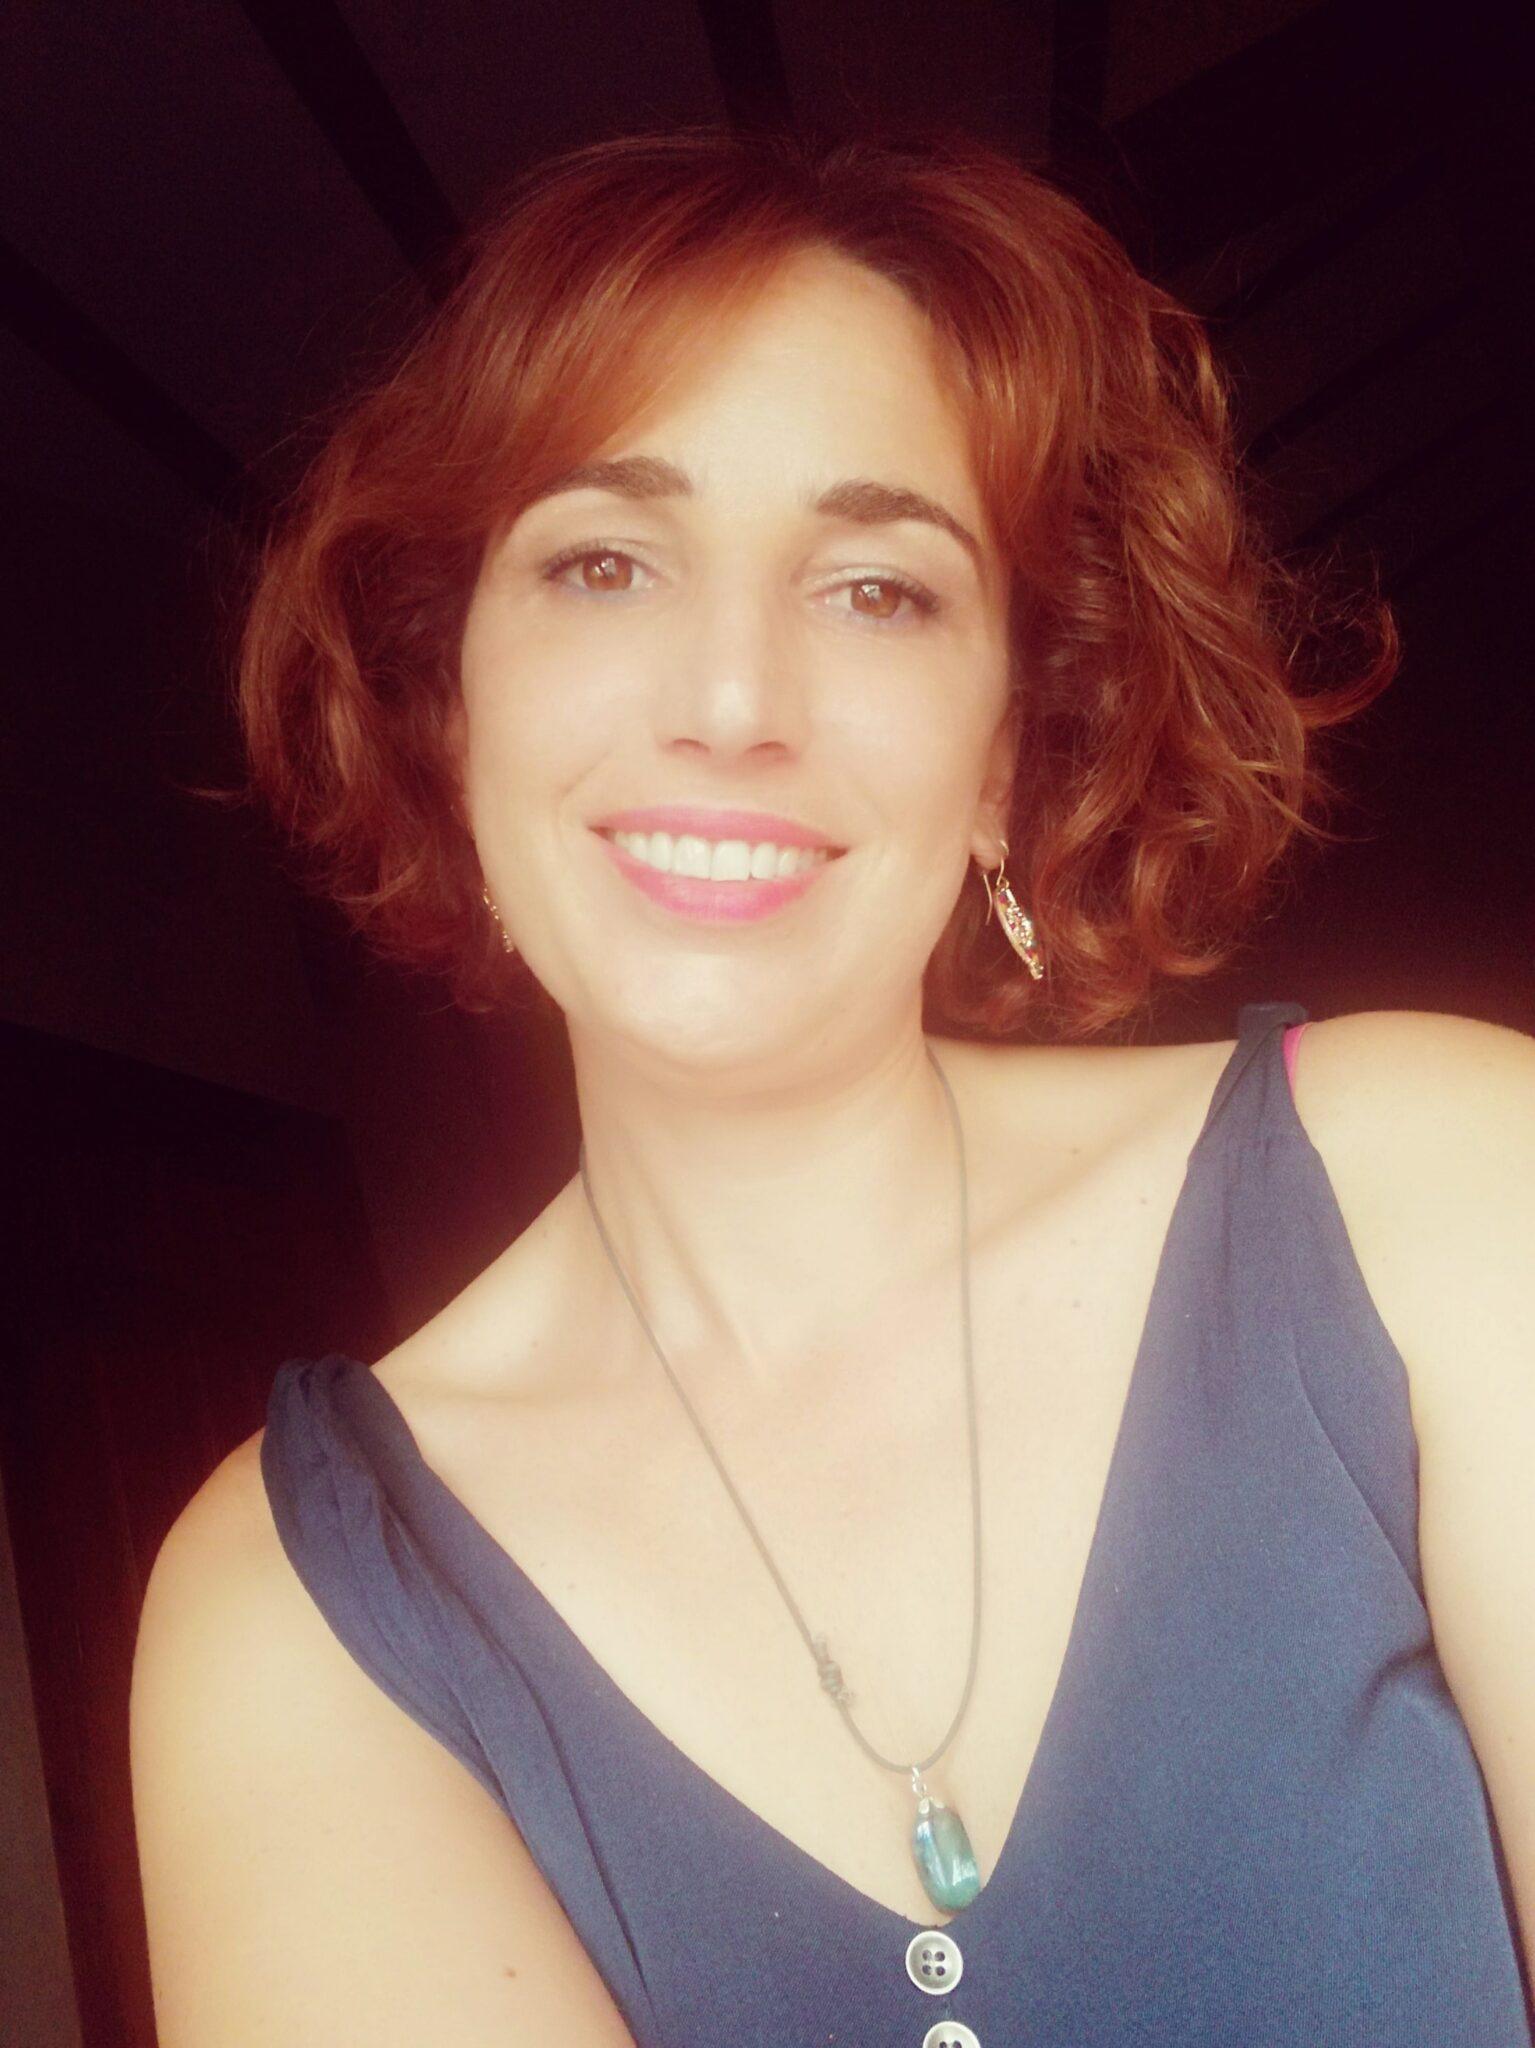 Mireia Coralchán. Luces de Neón. autora Avant Editorial